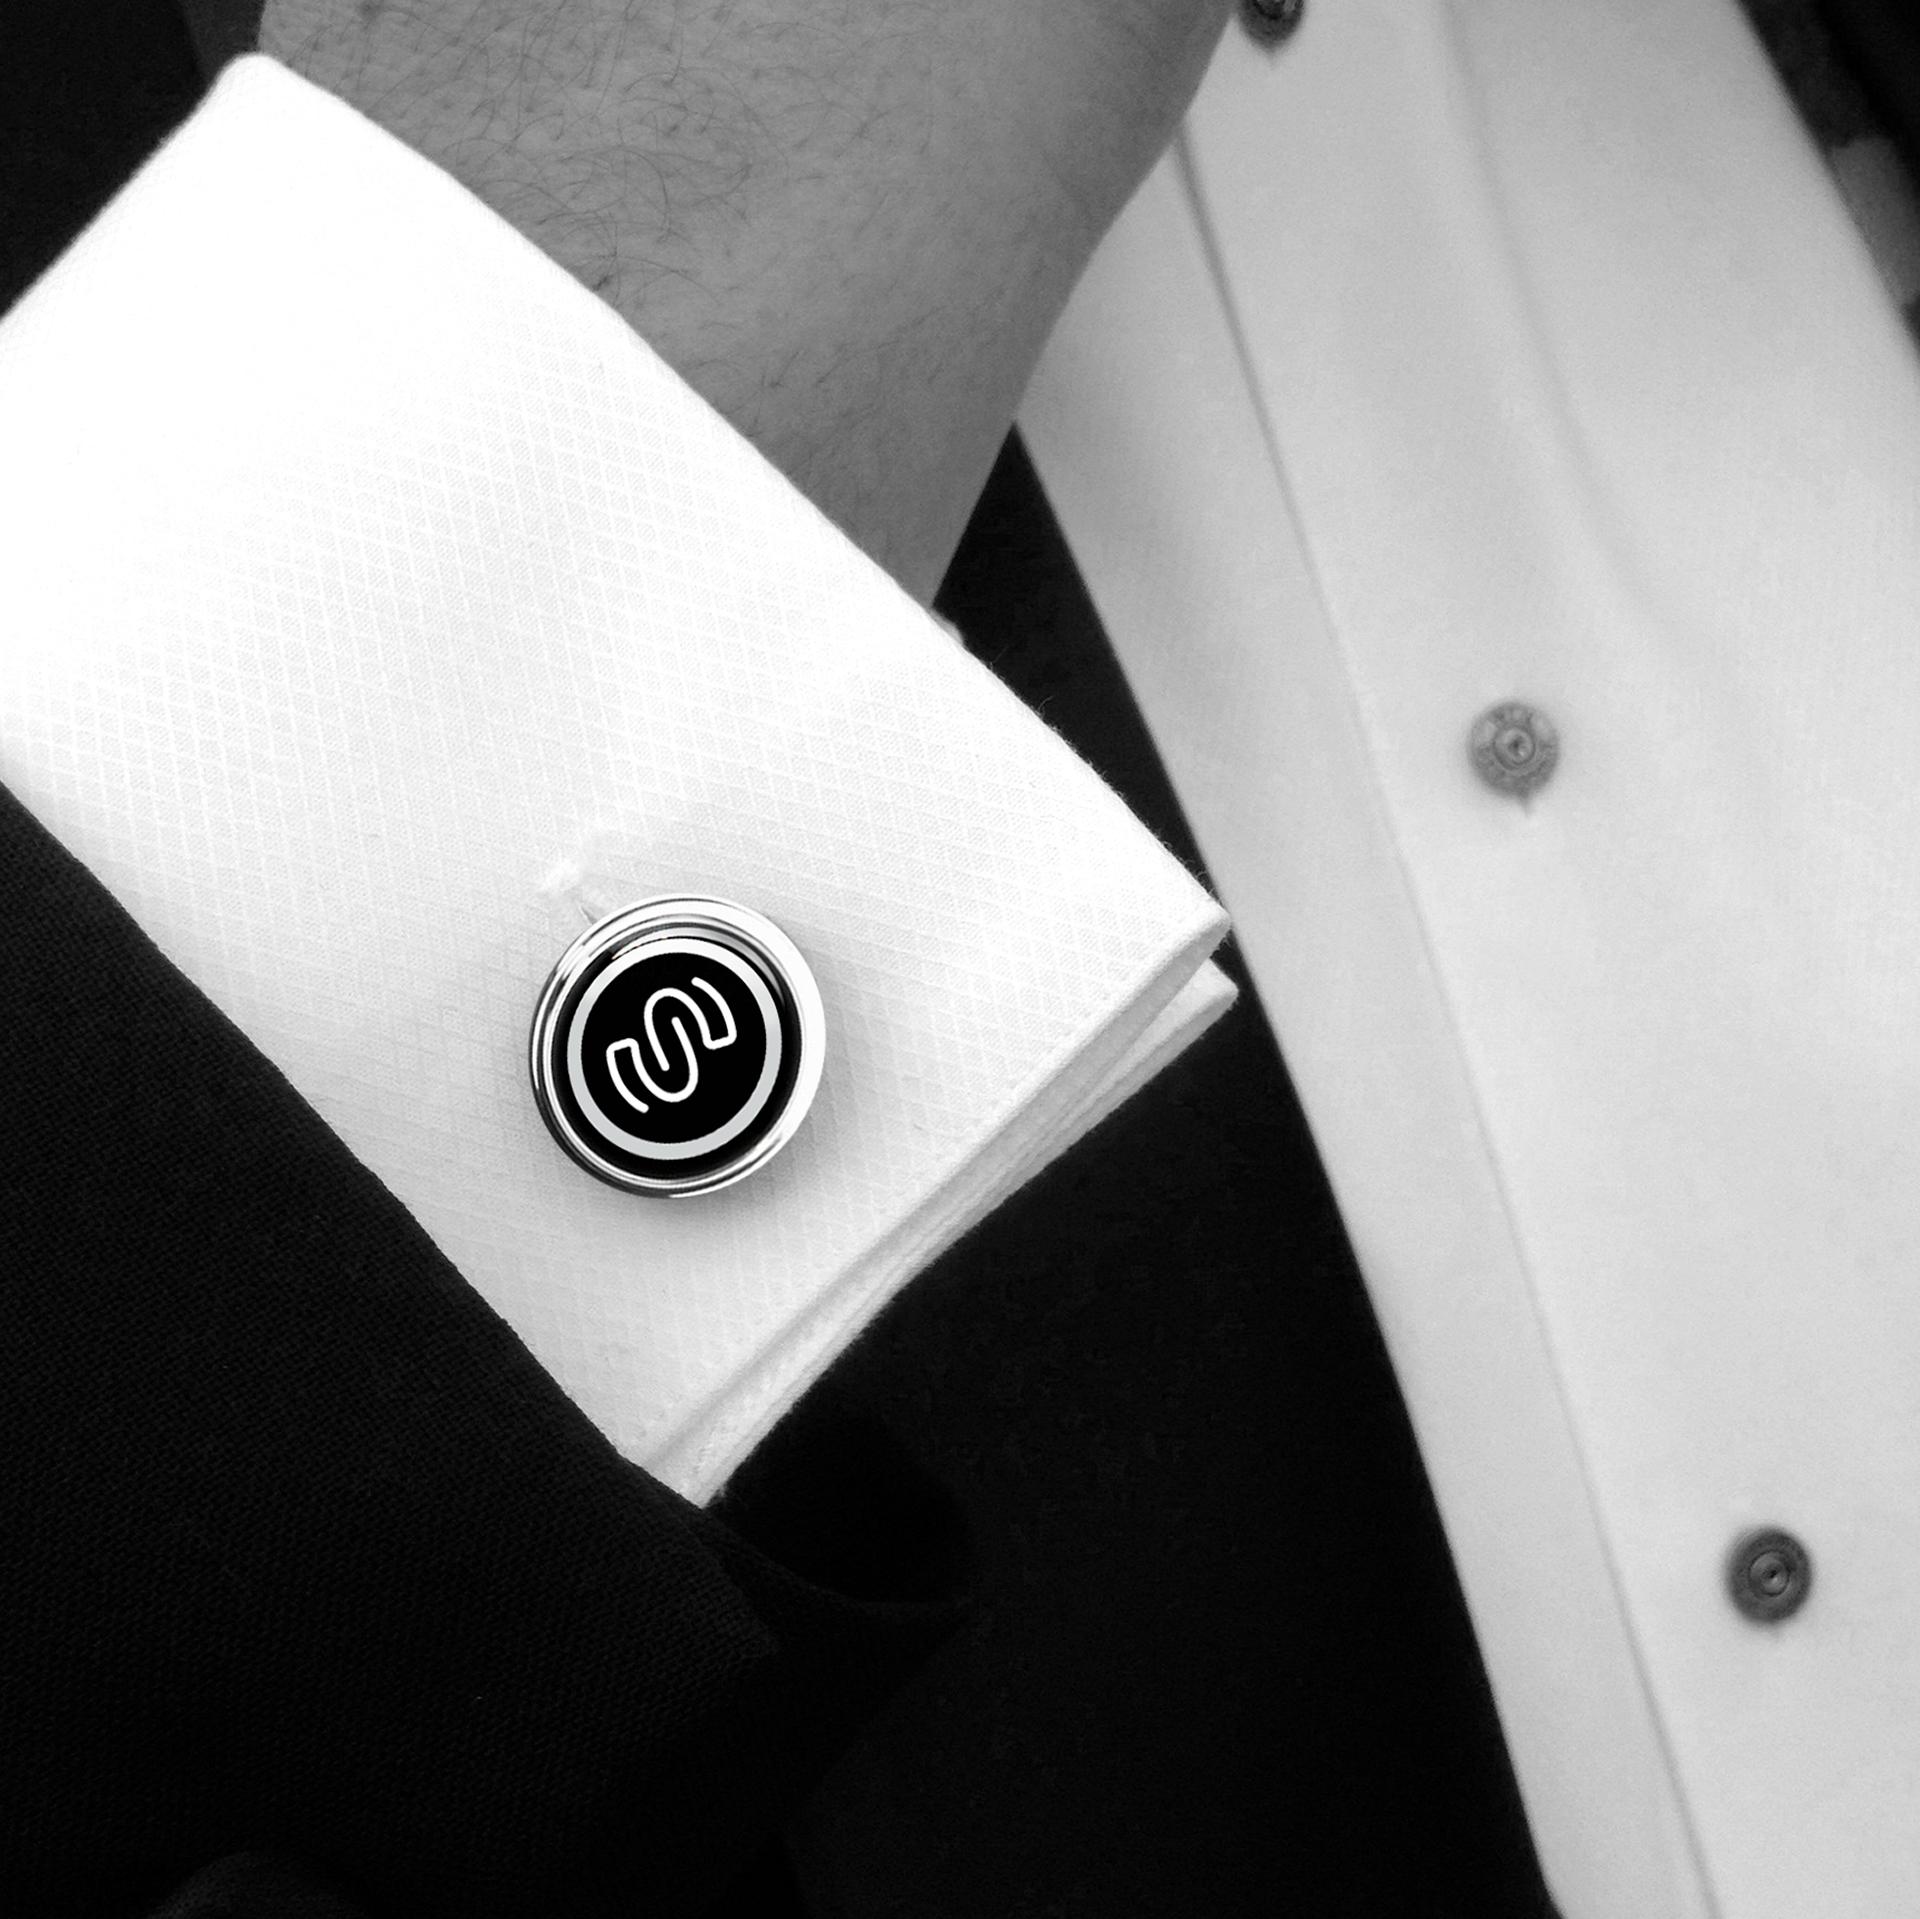 Seneworth - Close up on person wearing branded cufflinks